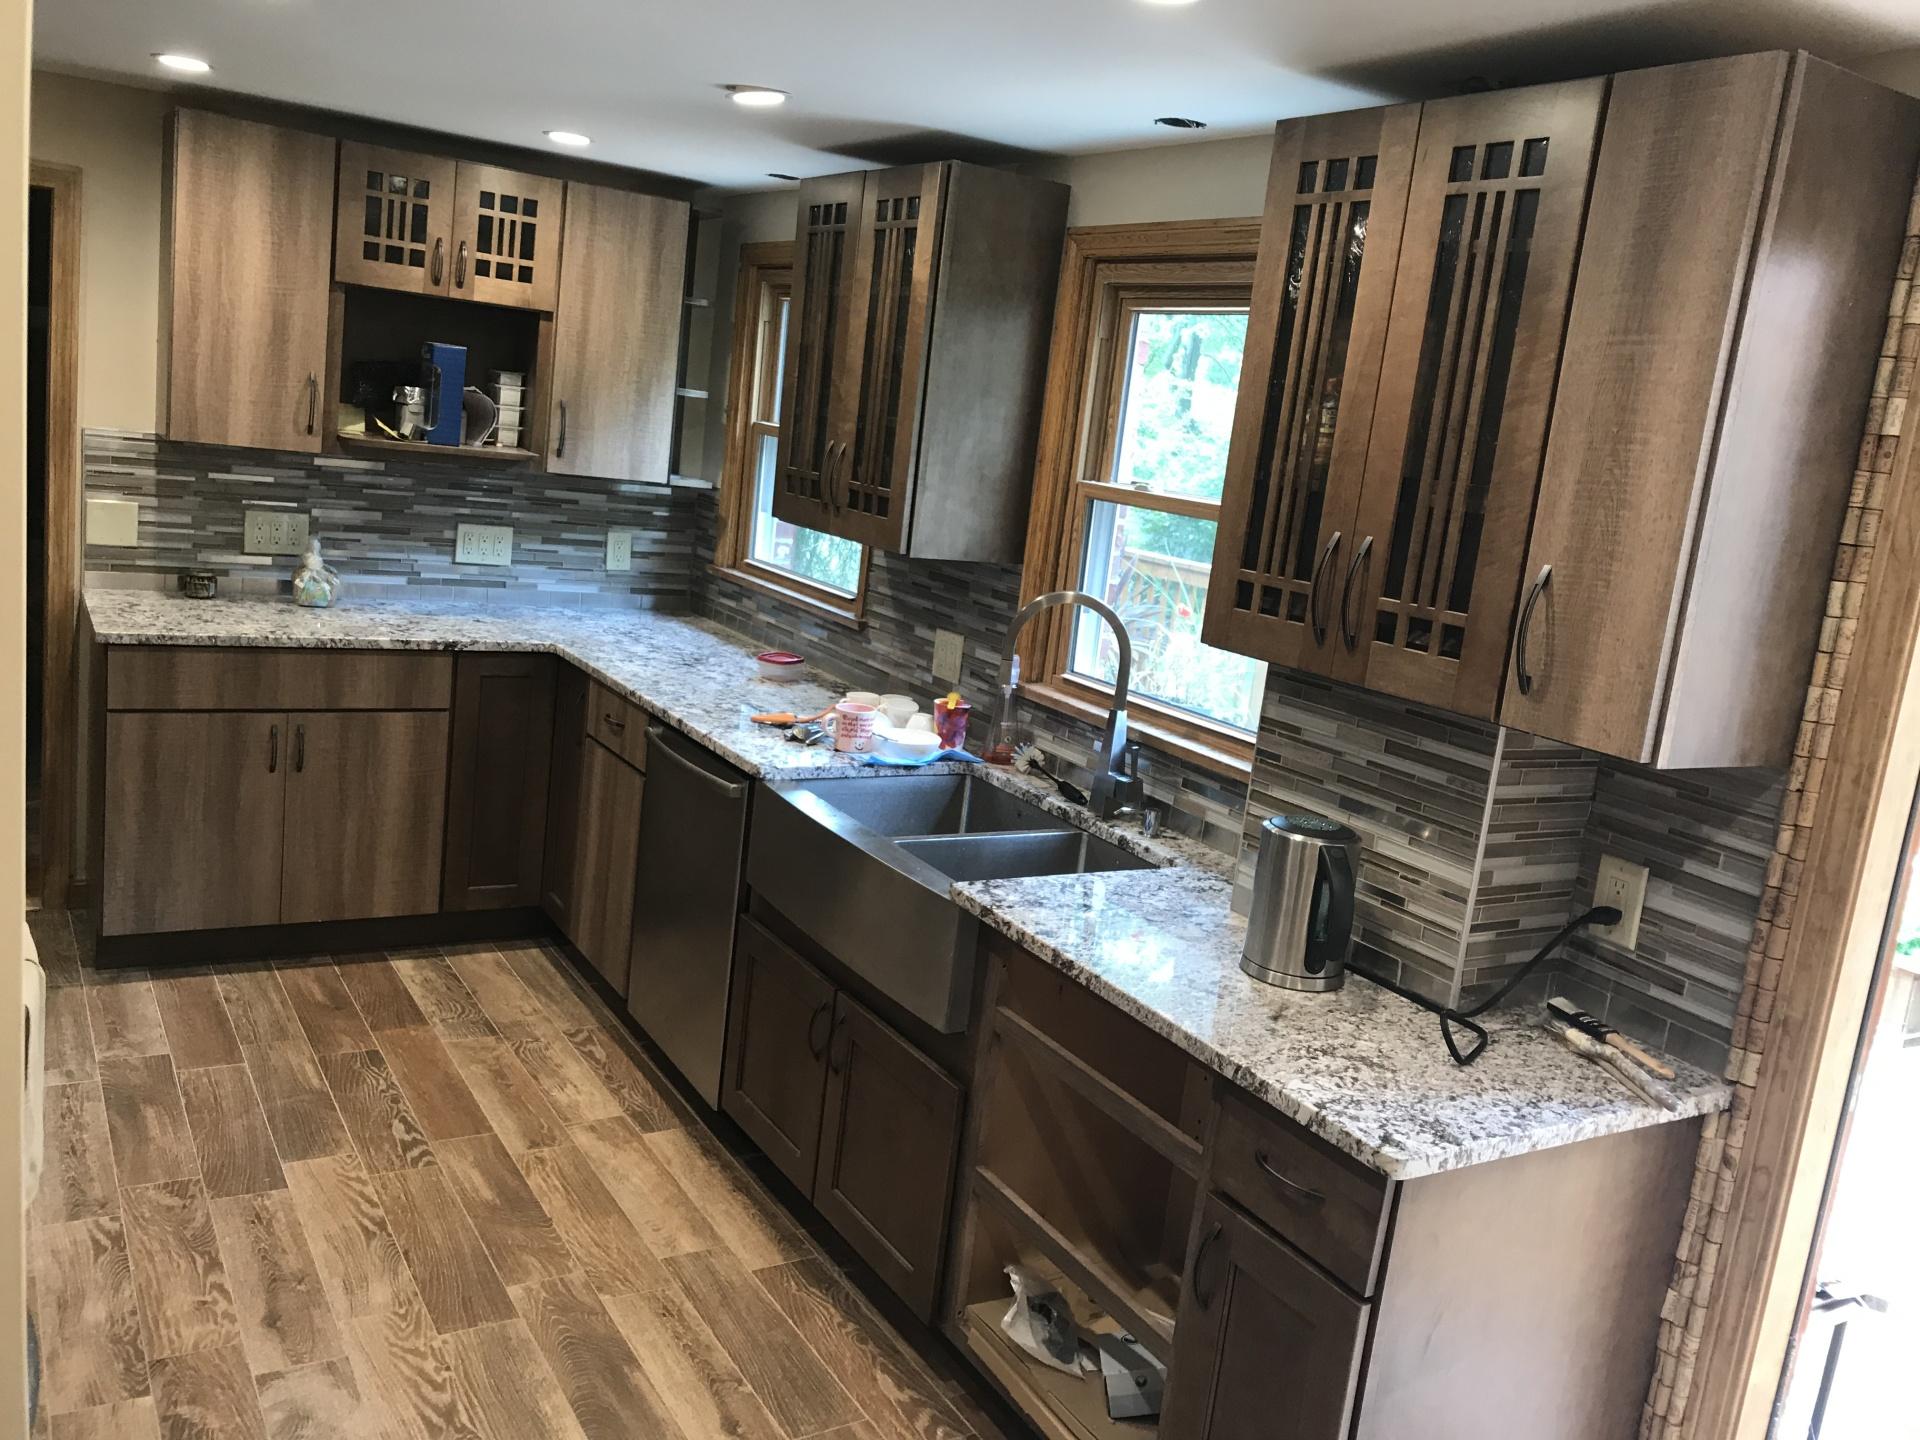 major kitchen remodeling, major kitchen renovation, kitchen cabinets replacement